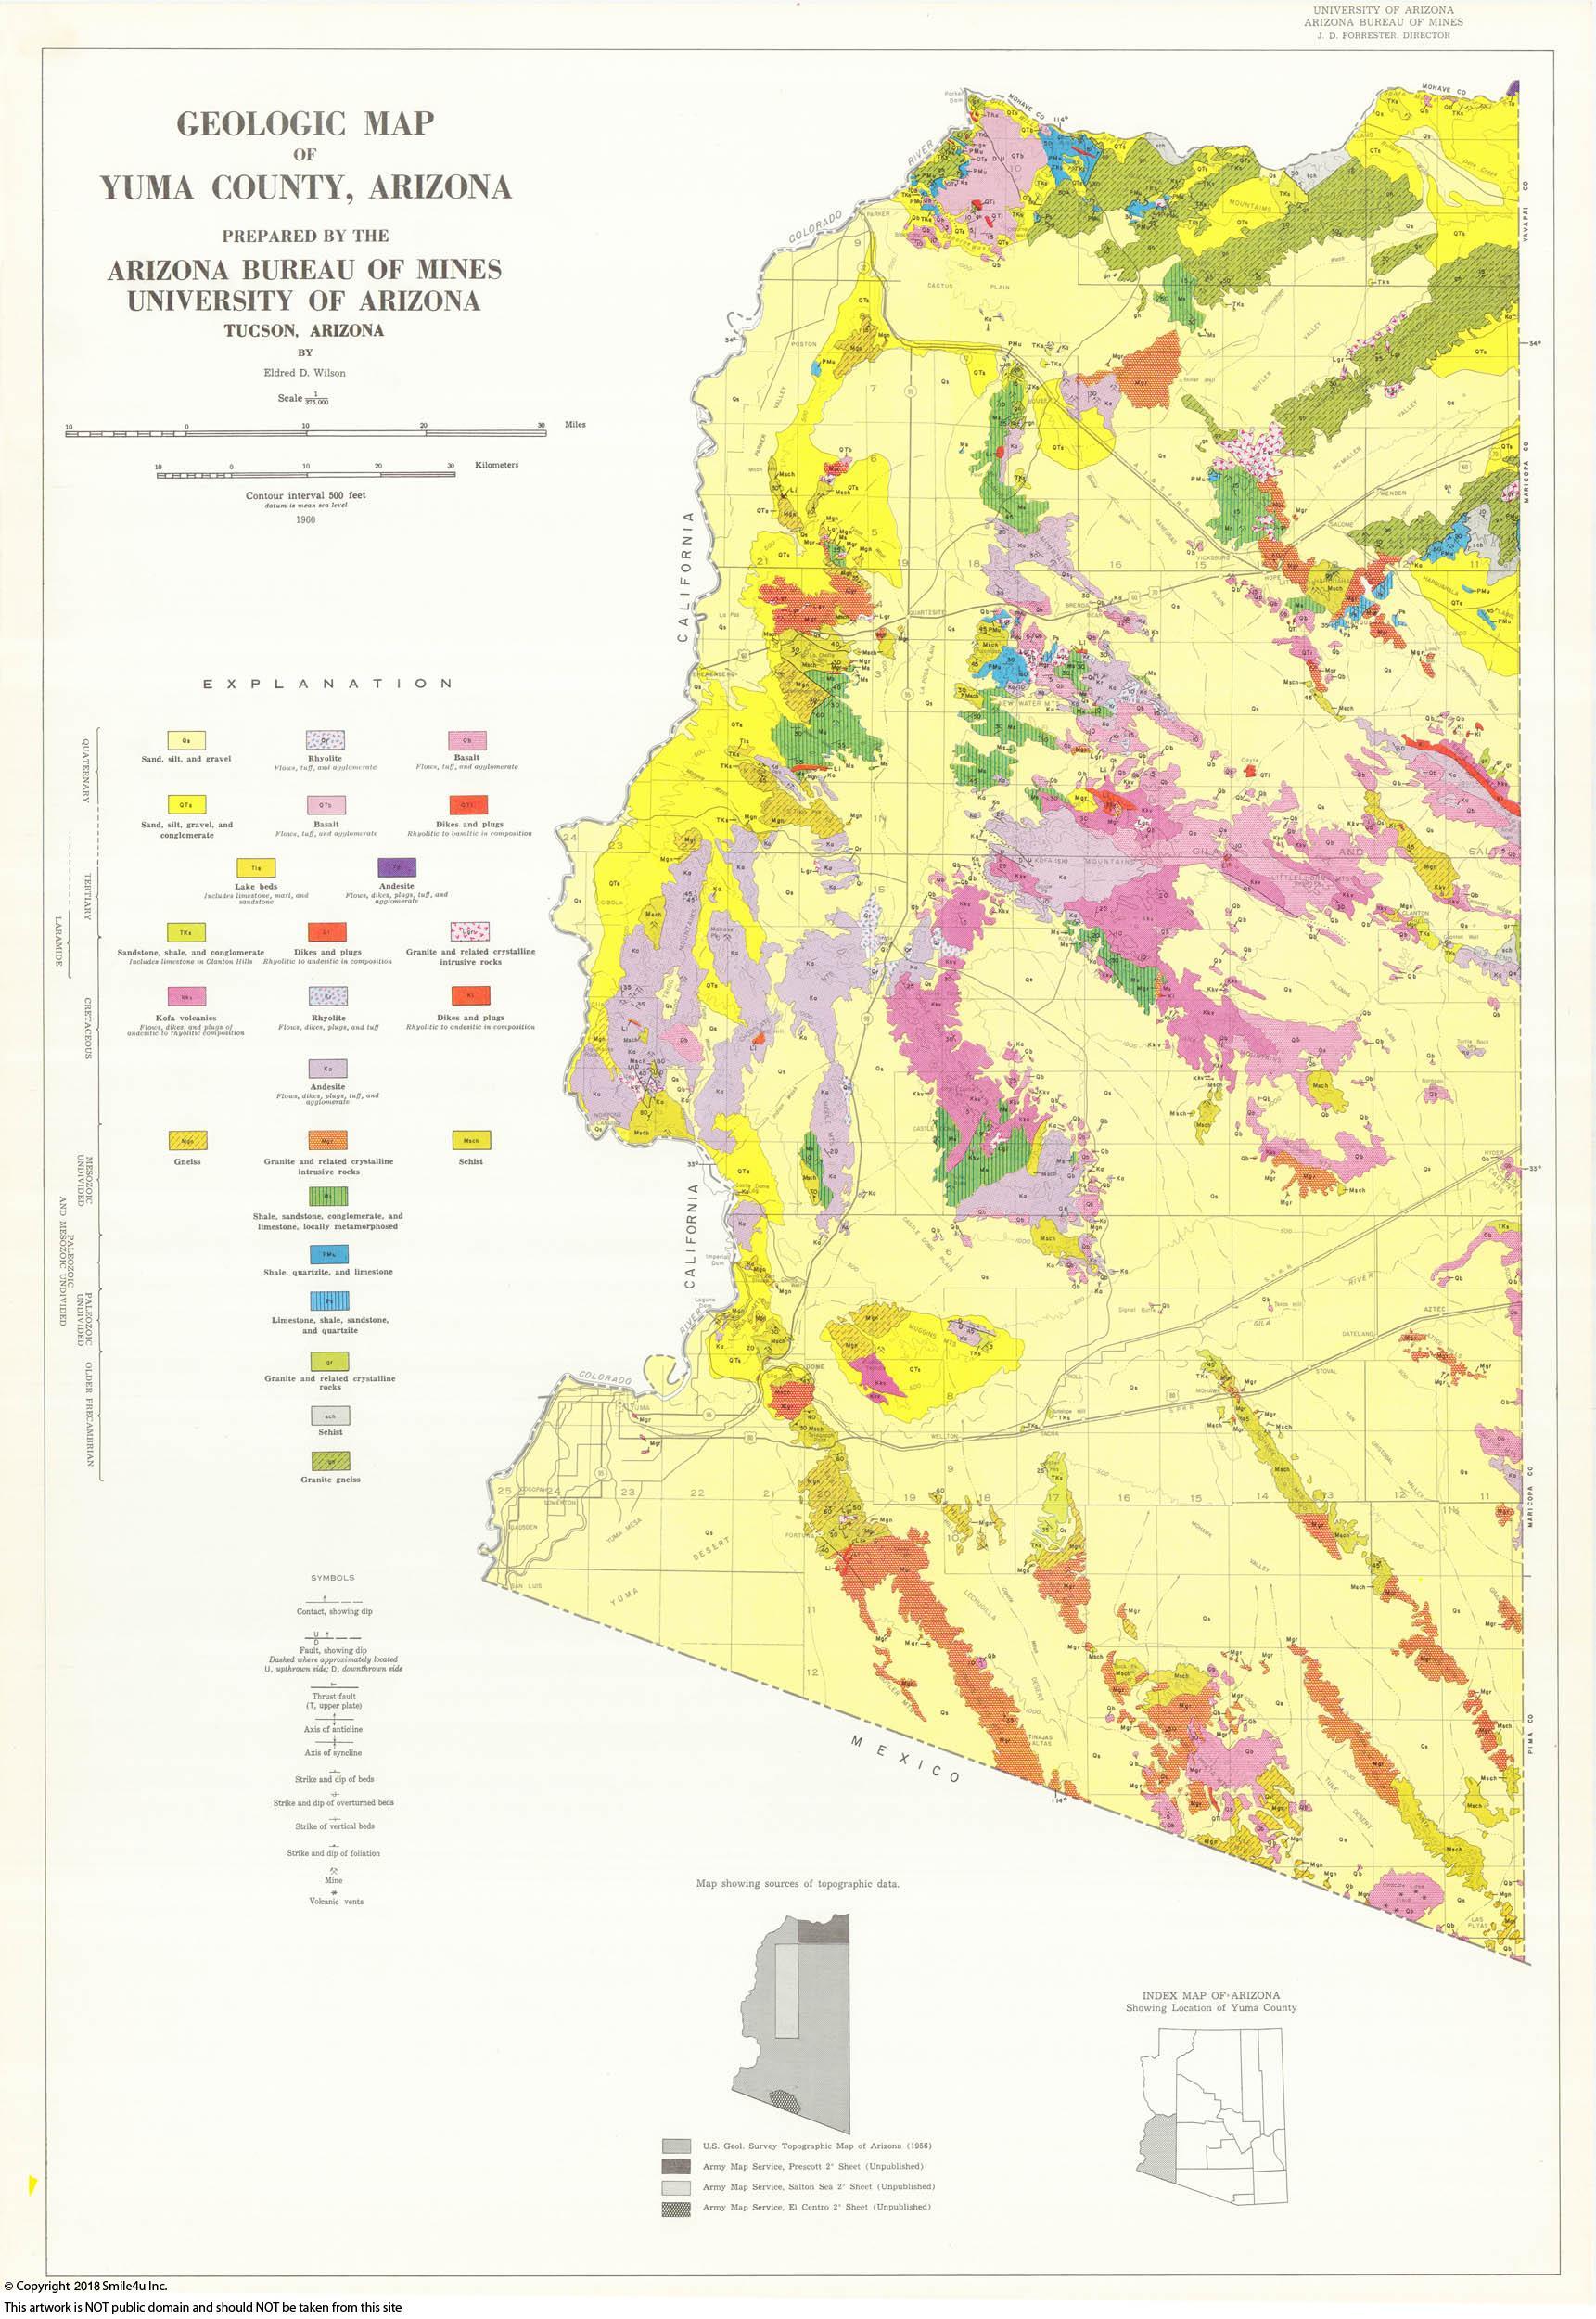 118464_watermarked_yumacounty_1960_geologicmap.jpg